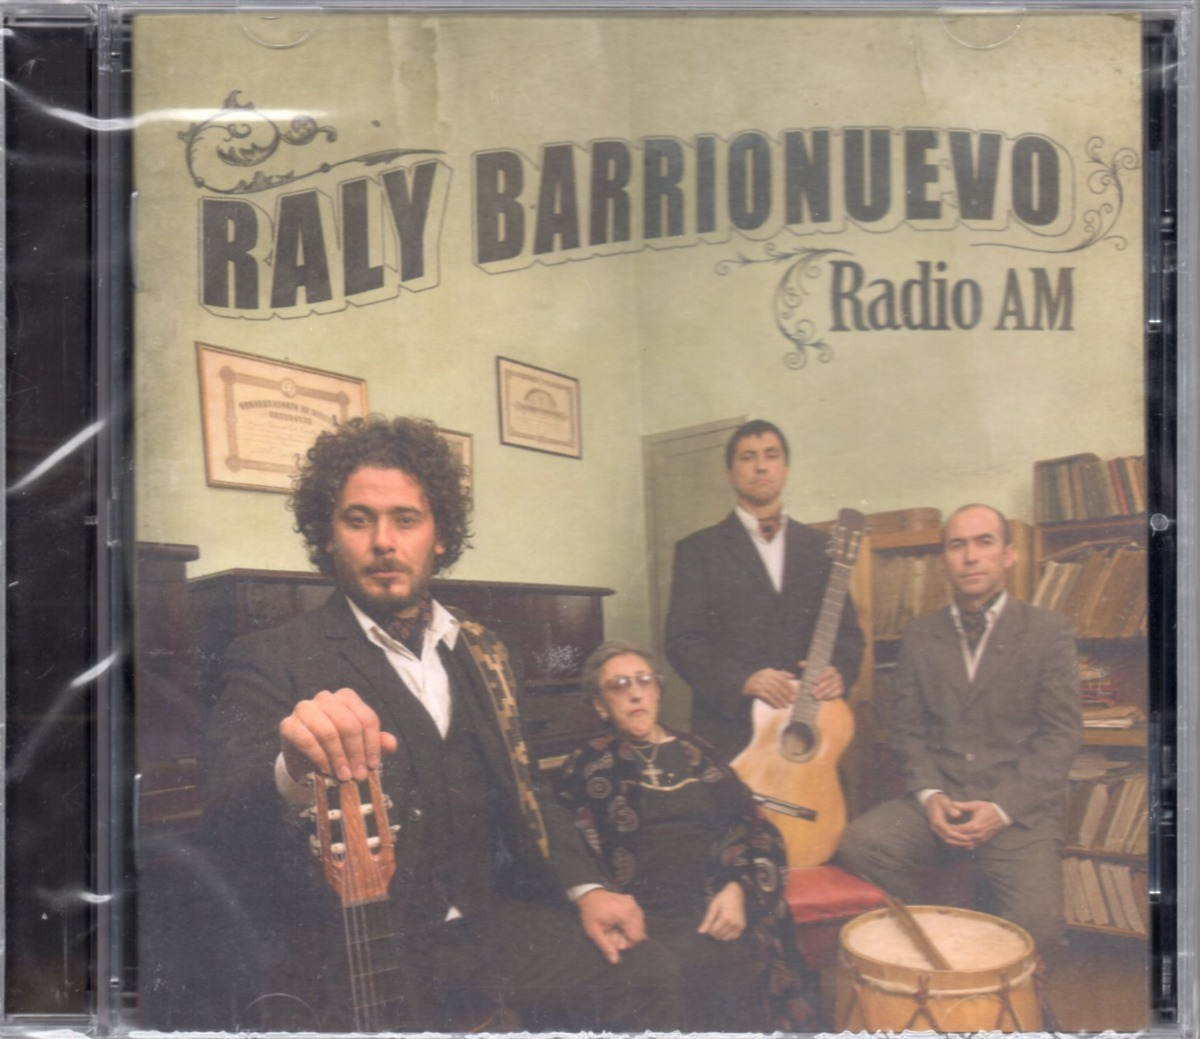 raly barrionuevo radio am